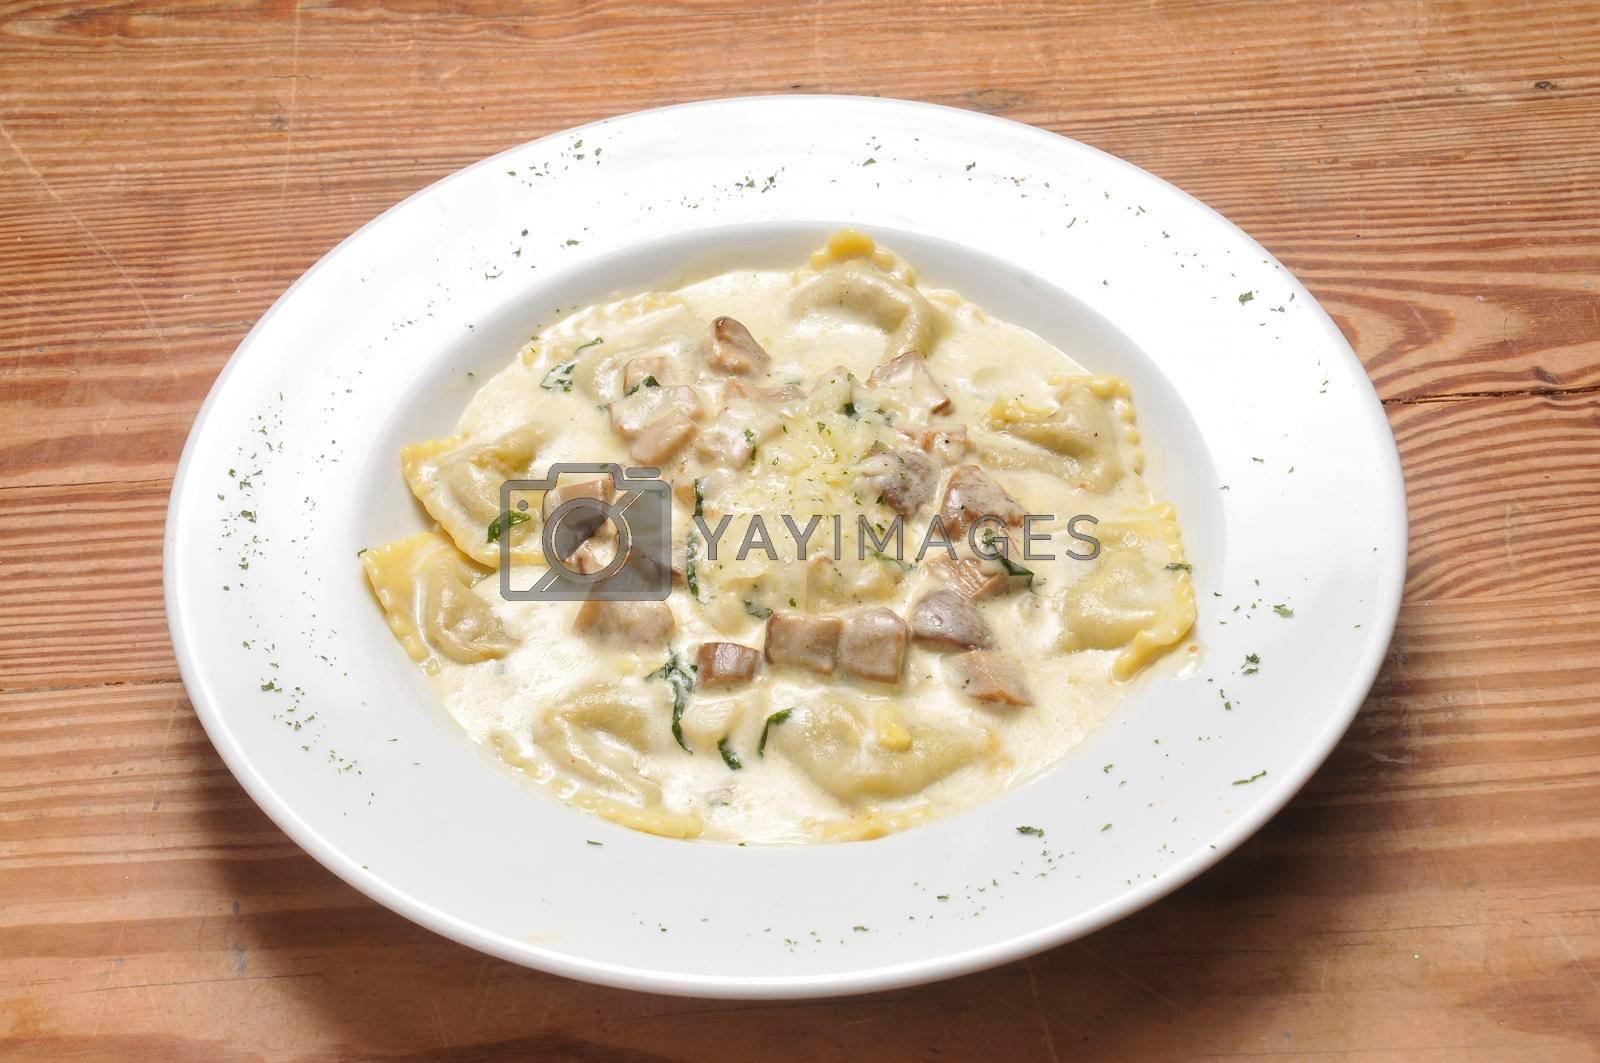 Authentic Italian cuisine known as Ravioli Cortina